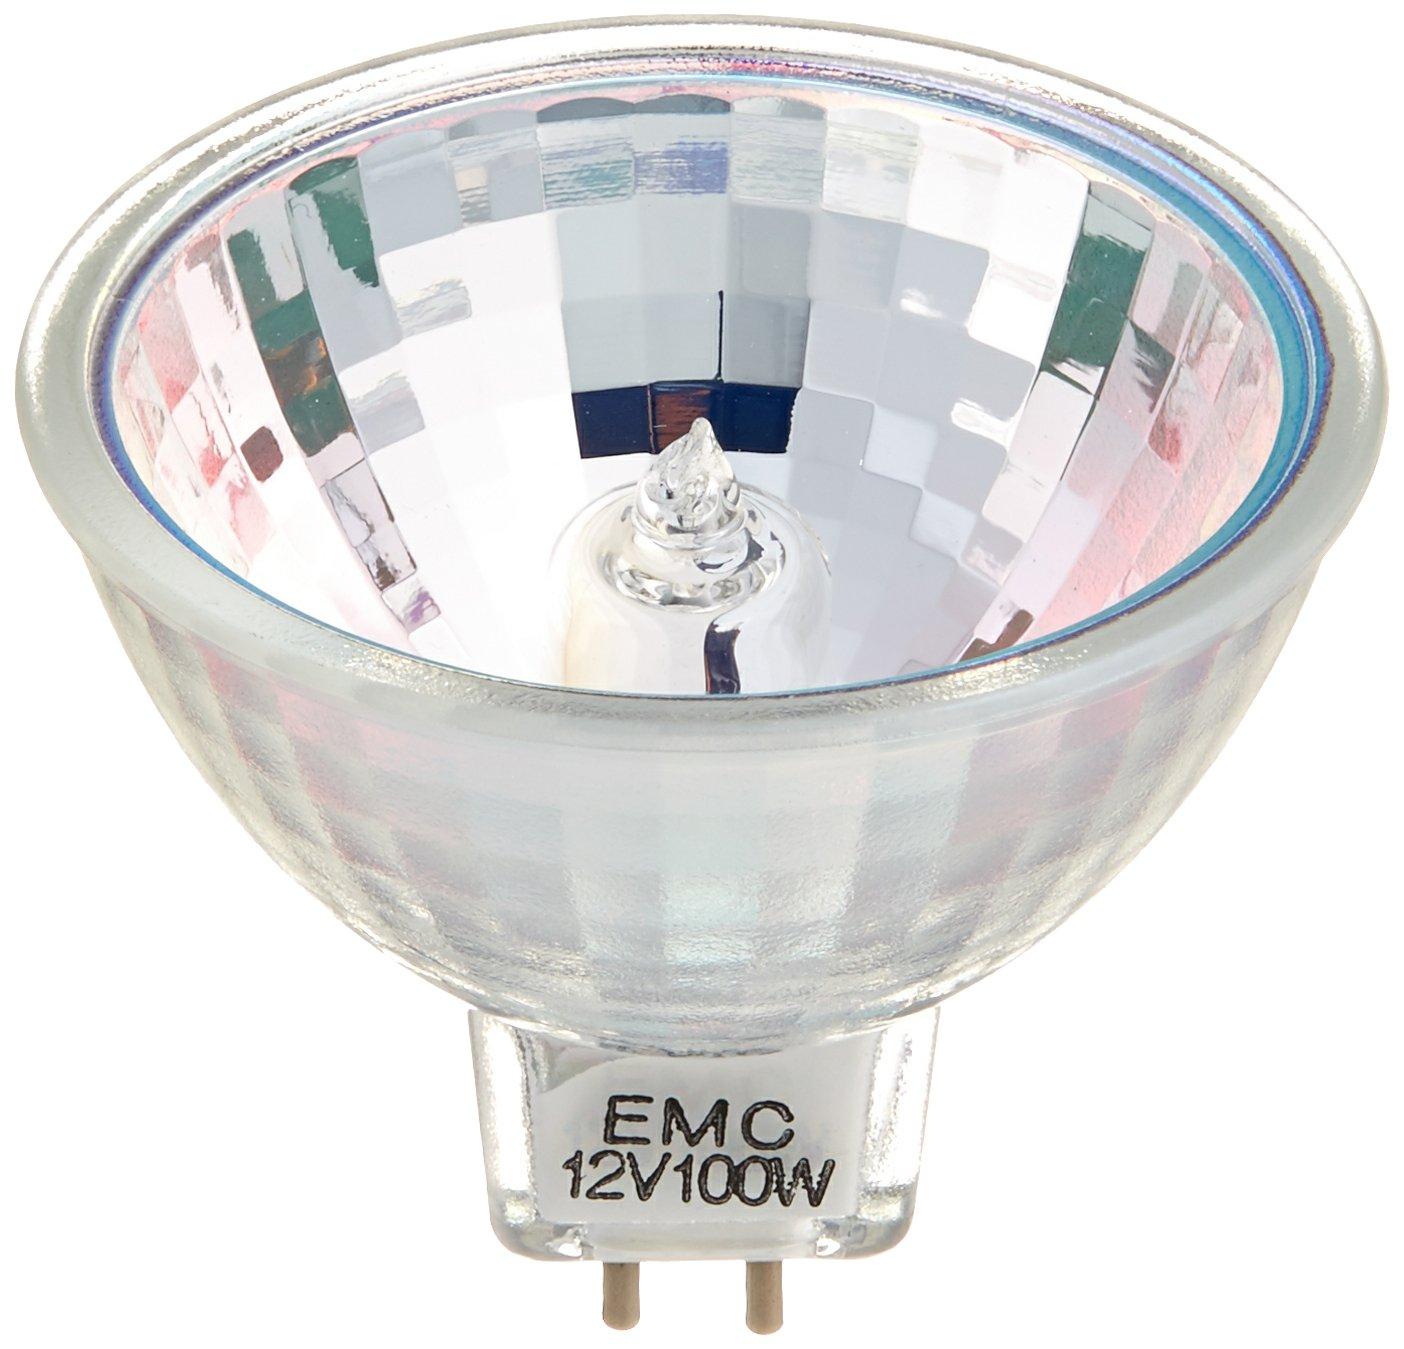 Ushio BC6273 1000326 EMC JCR12V-100W Projector Light Bulb